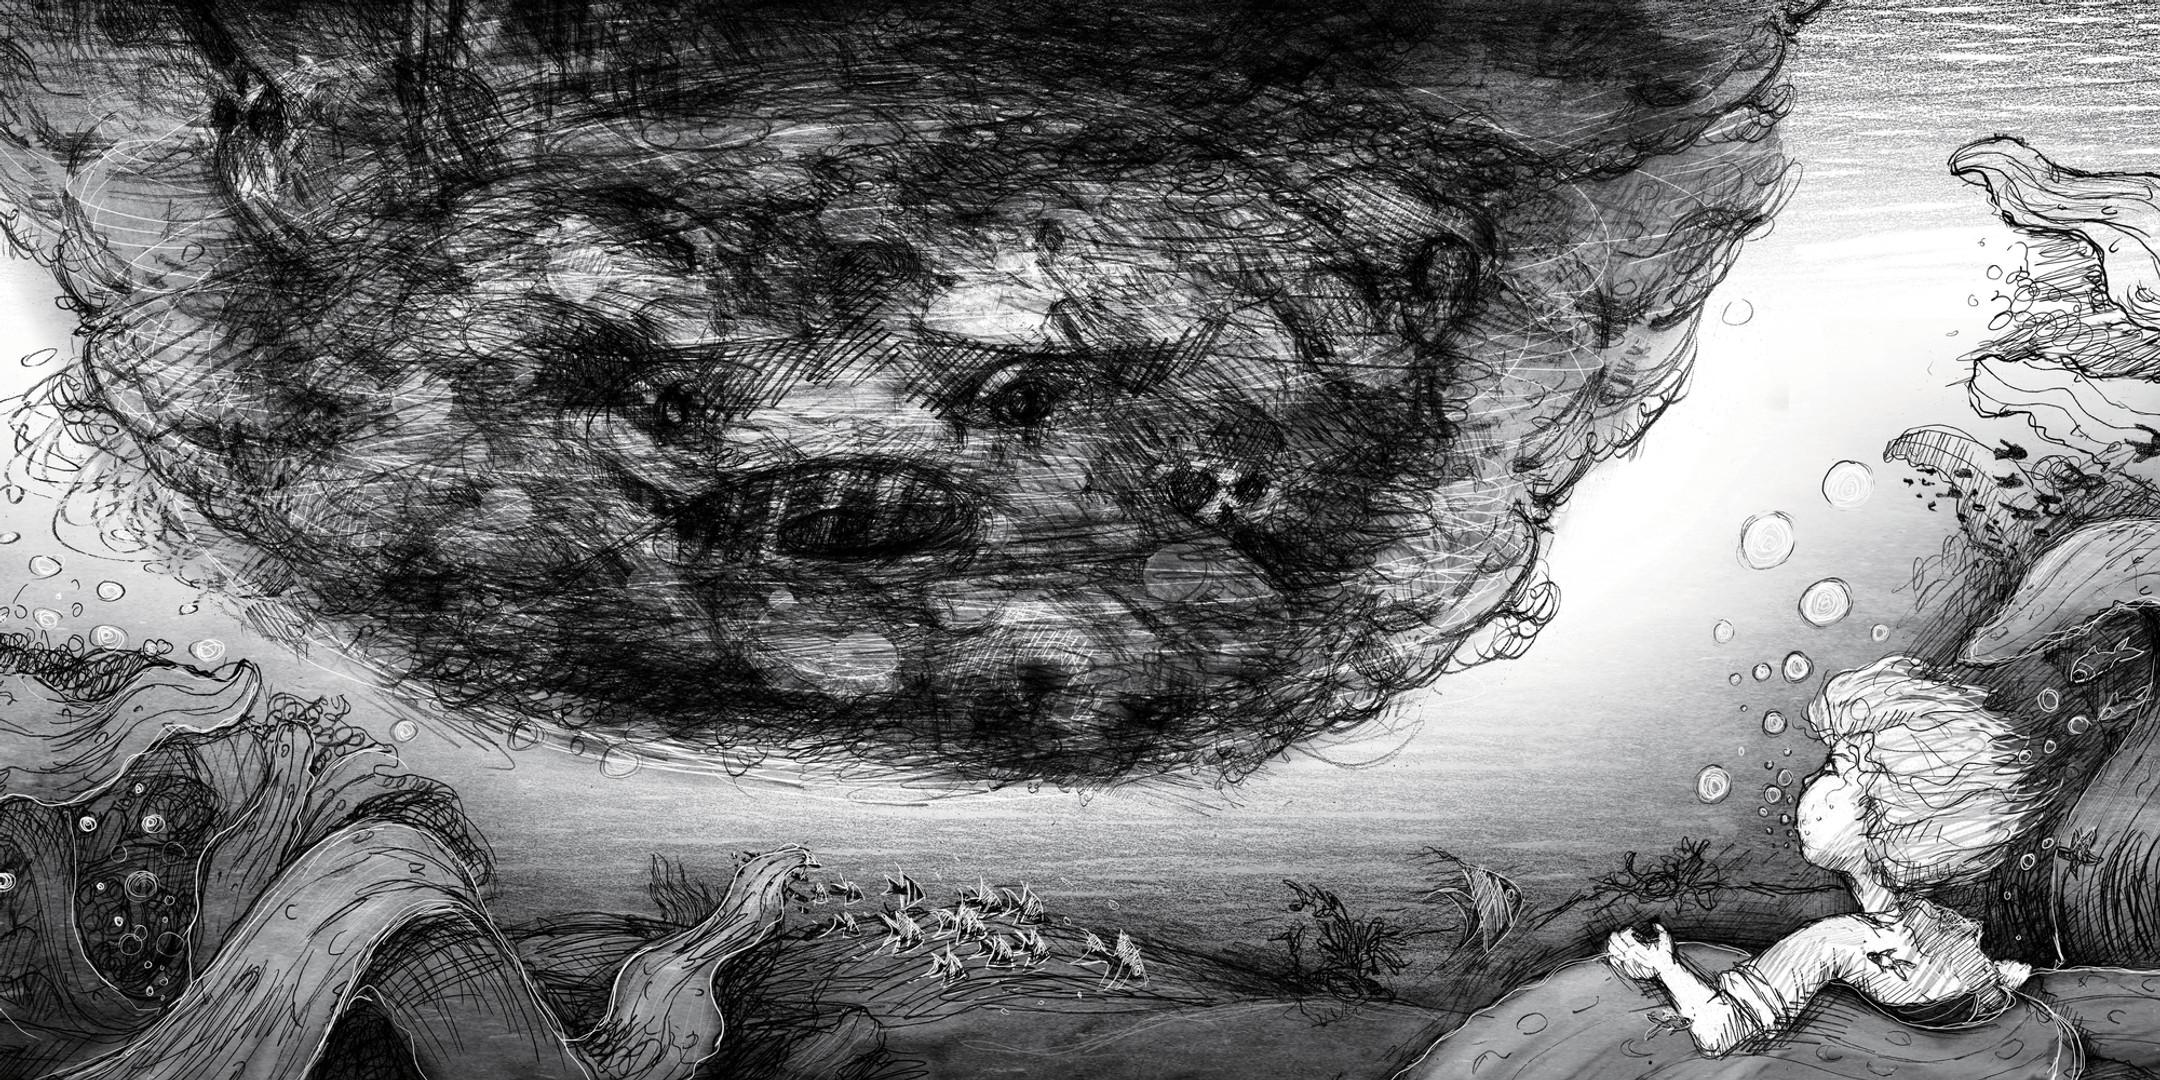 The Boy Mermaid & Storm_10x1022.jpg